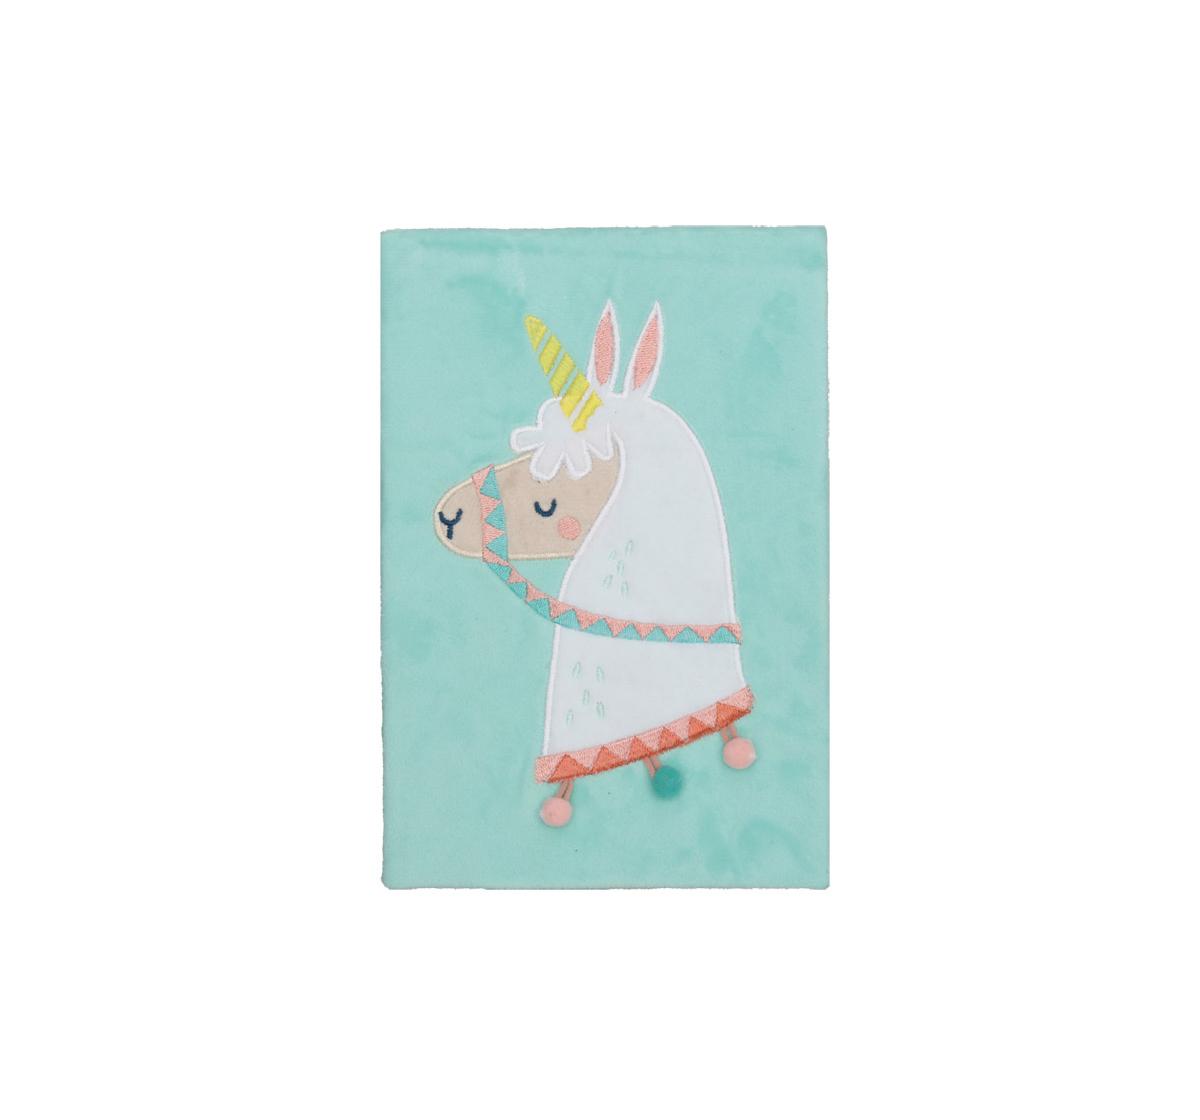 Syloon | Syloon Sloth Llama - Llama Fluffy A5 Notebook Study & Desk Accessories for Kids age 5Y+